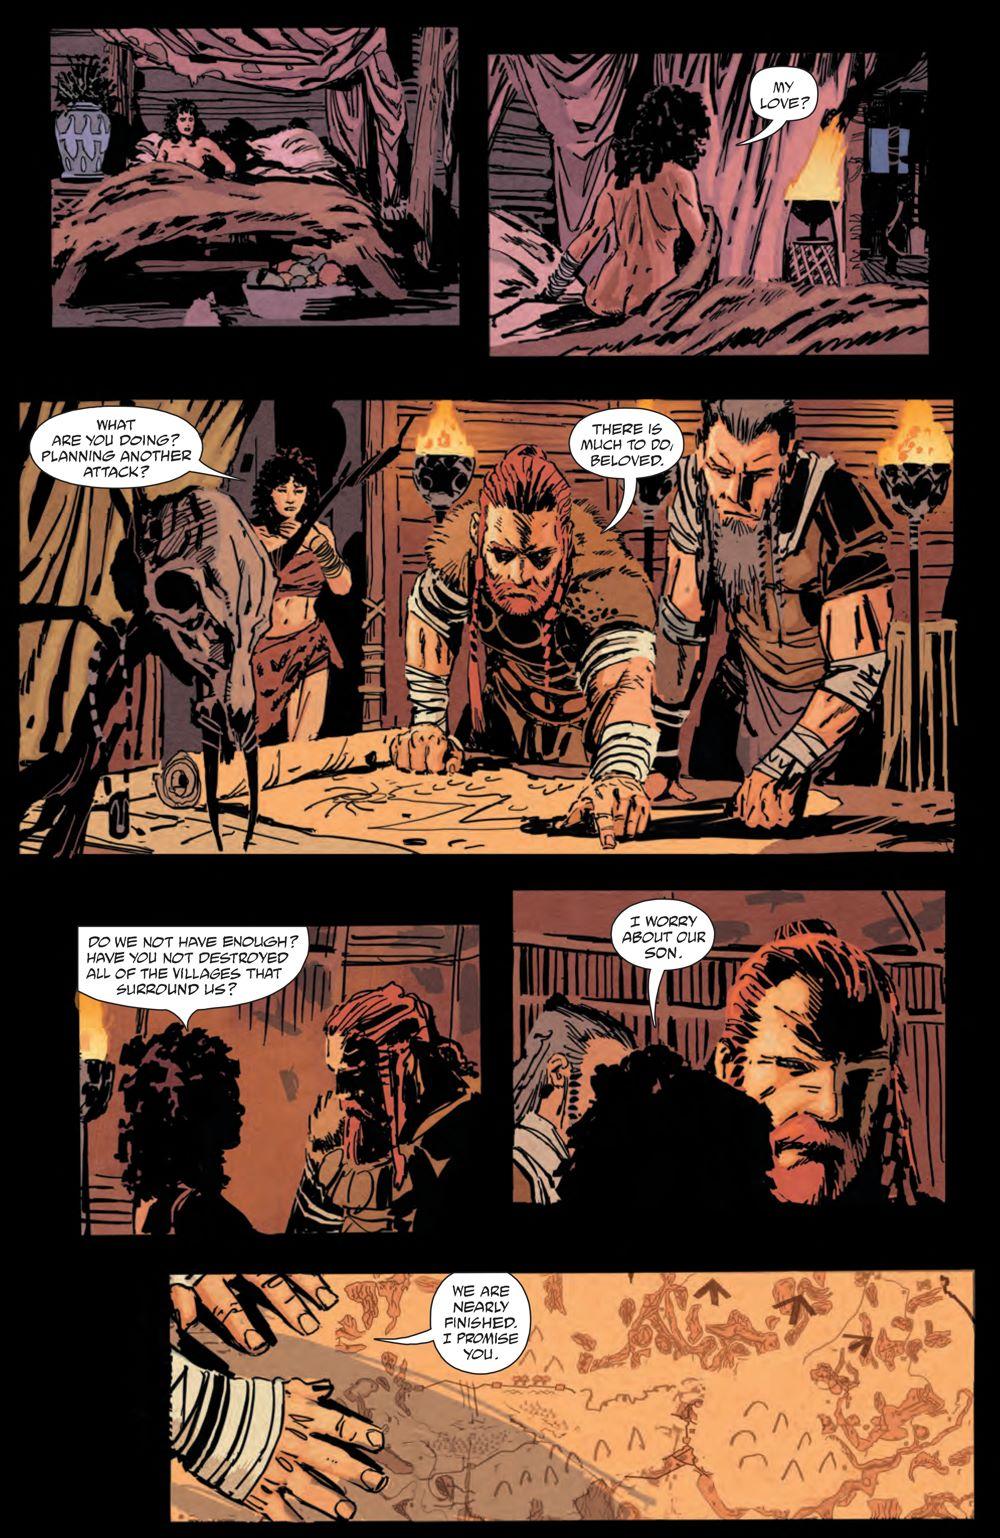 BRZRKR_003_PRESS_8 ComicList Previews: BRZRKR #3 (OF 12)